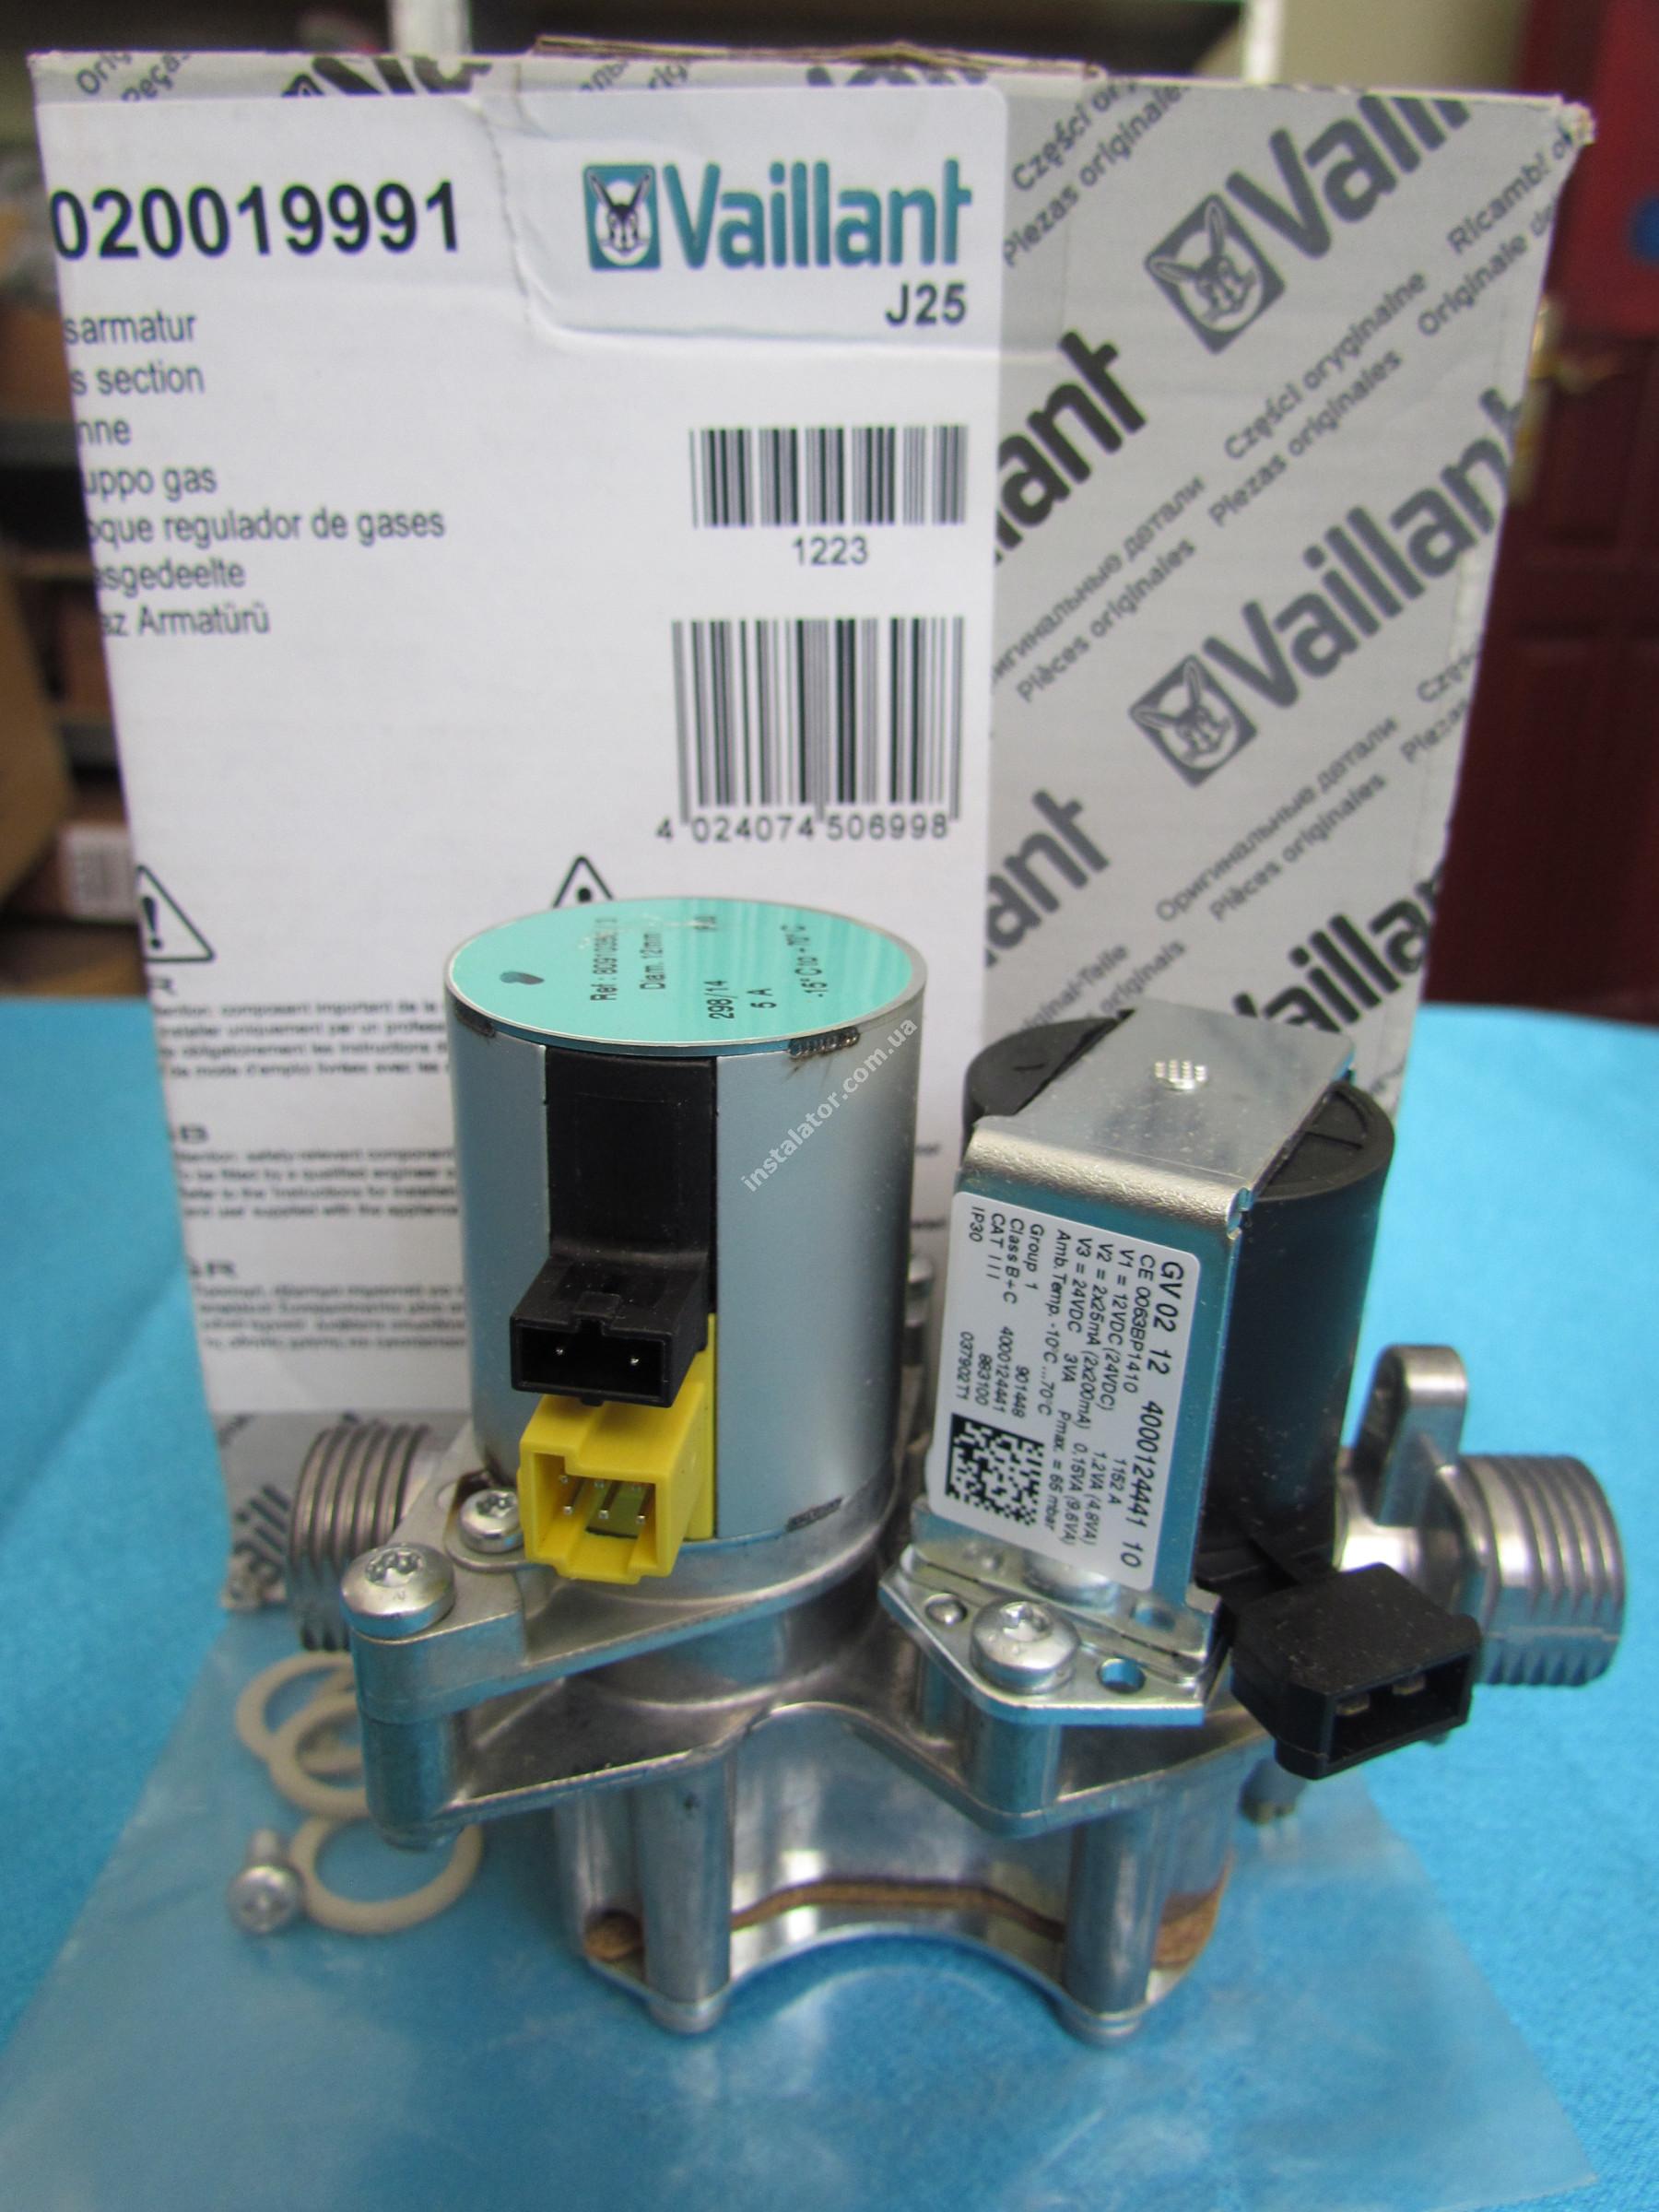 0020019991 Газовий клапан VAILLANT atmoTEC Pro / turboTEC Pro full-image-0